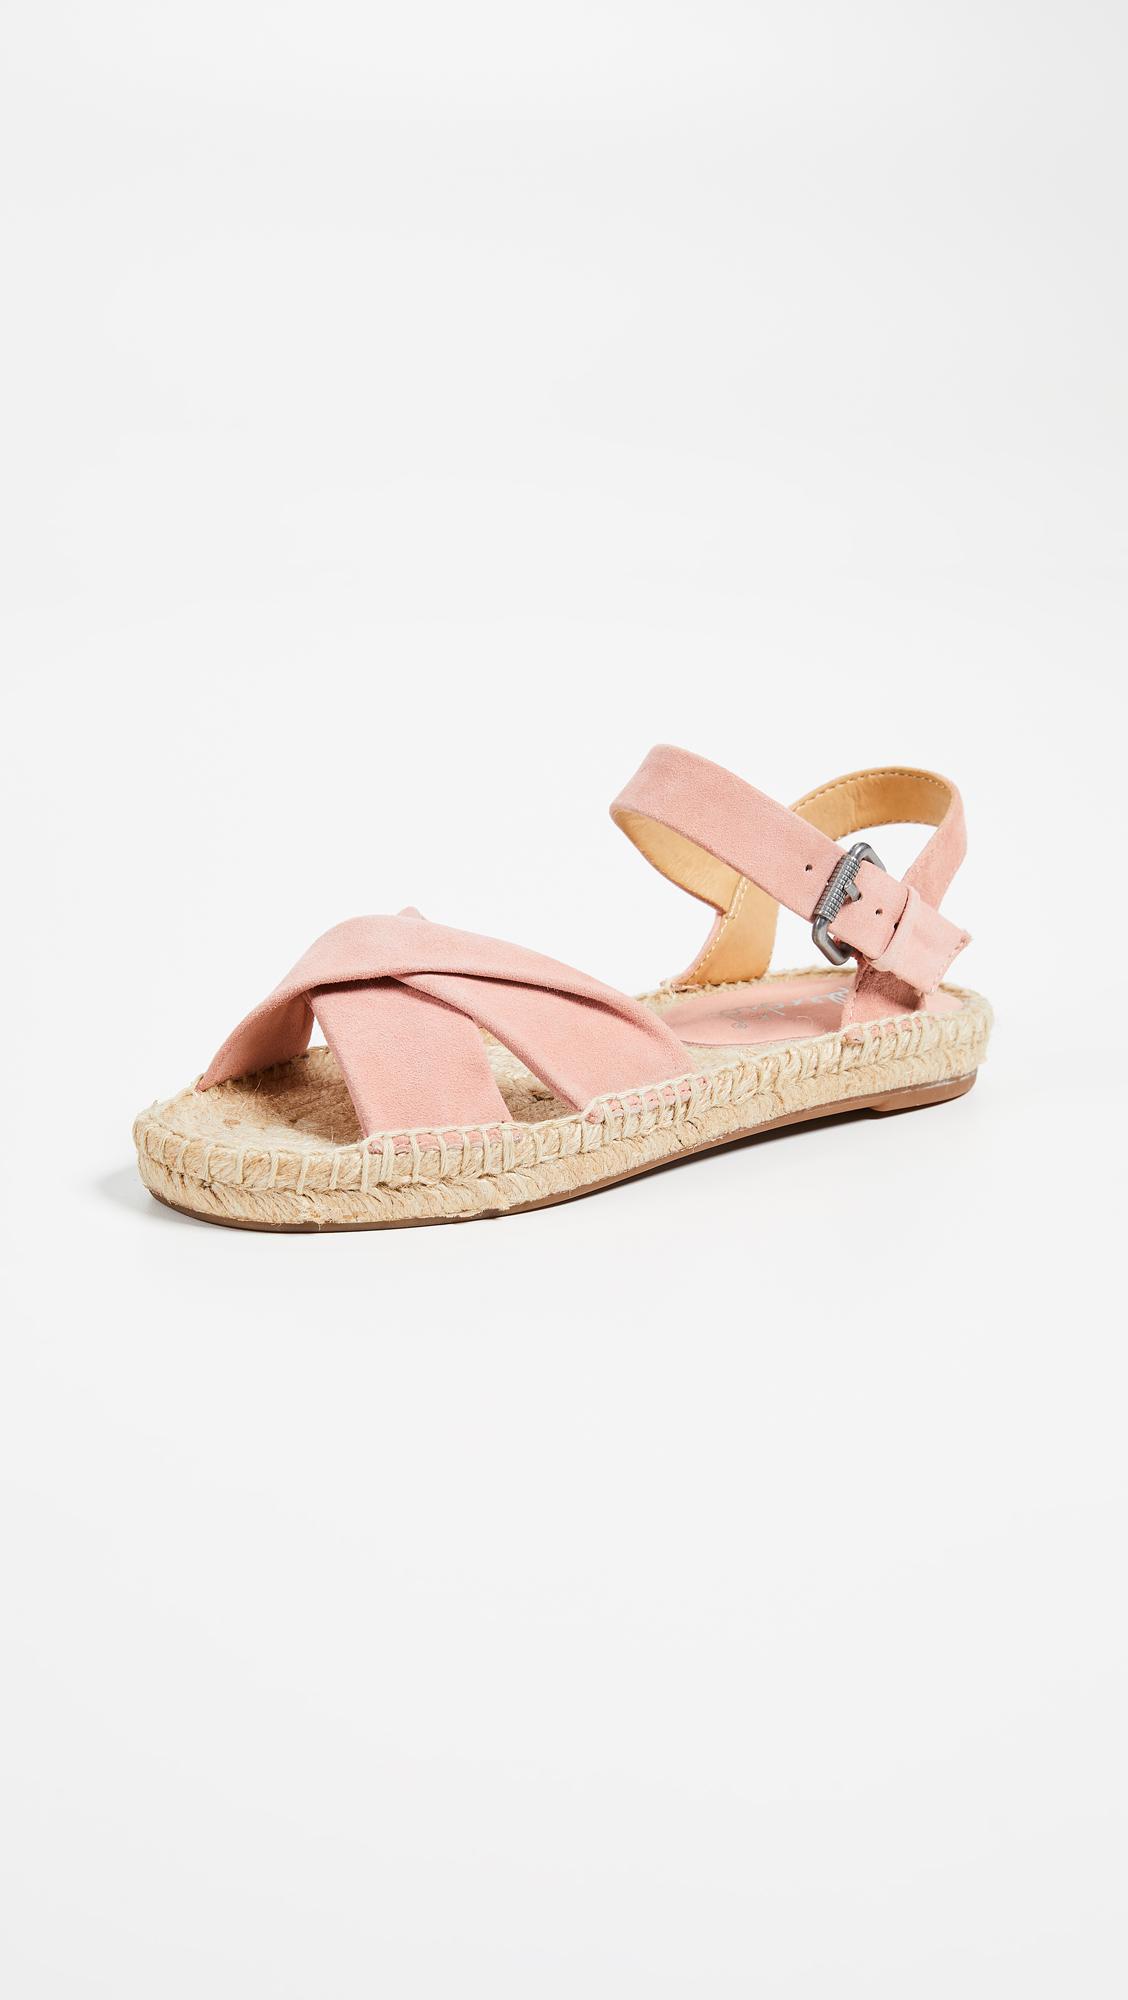 b716ef36786 Lyst - Splendid Fae Espadrille Sandals in Pink